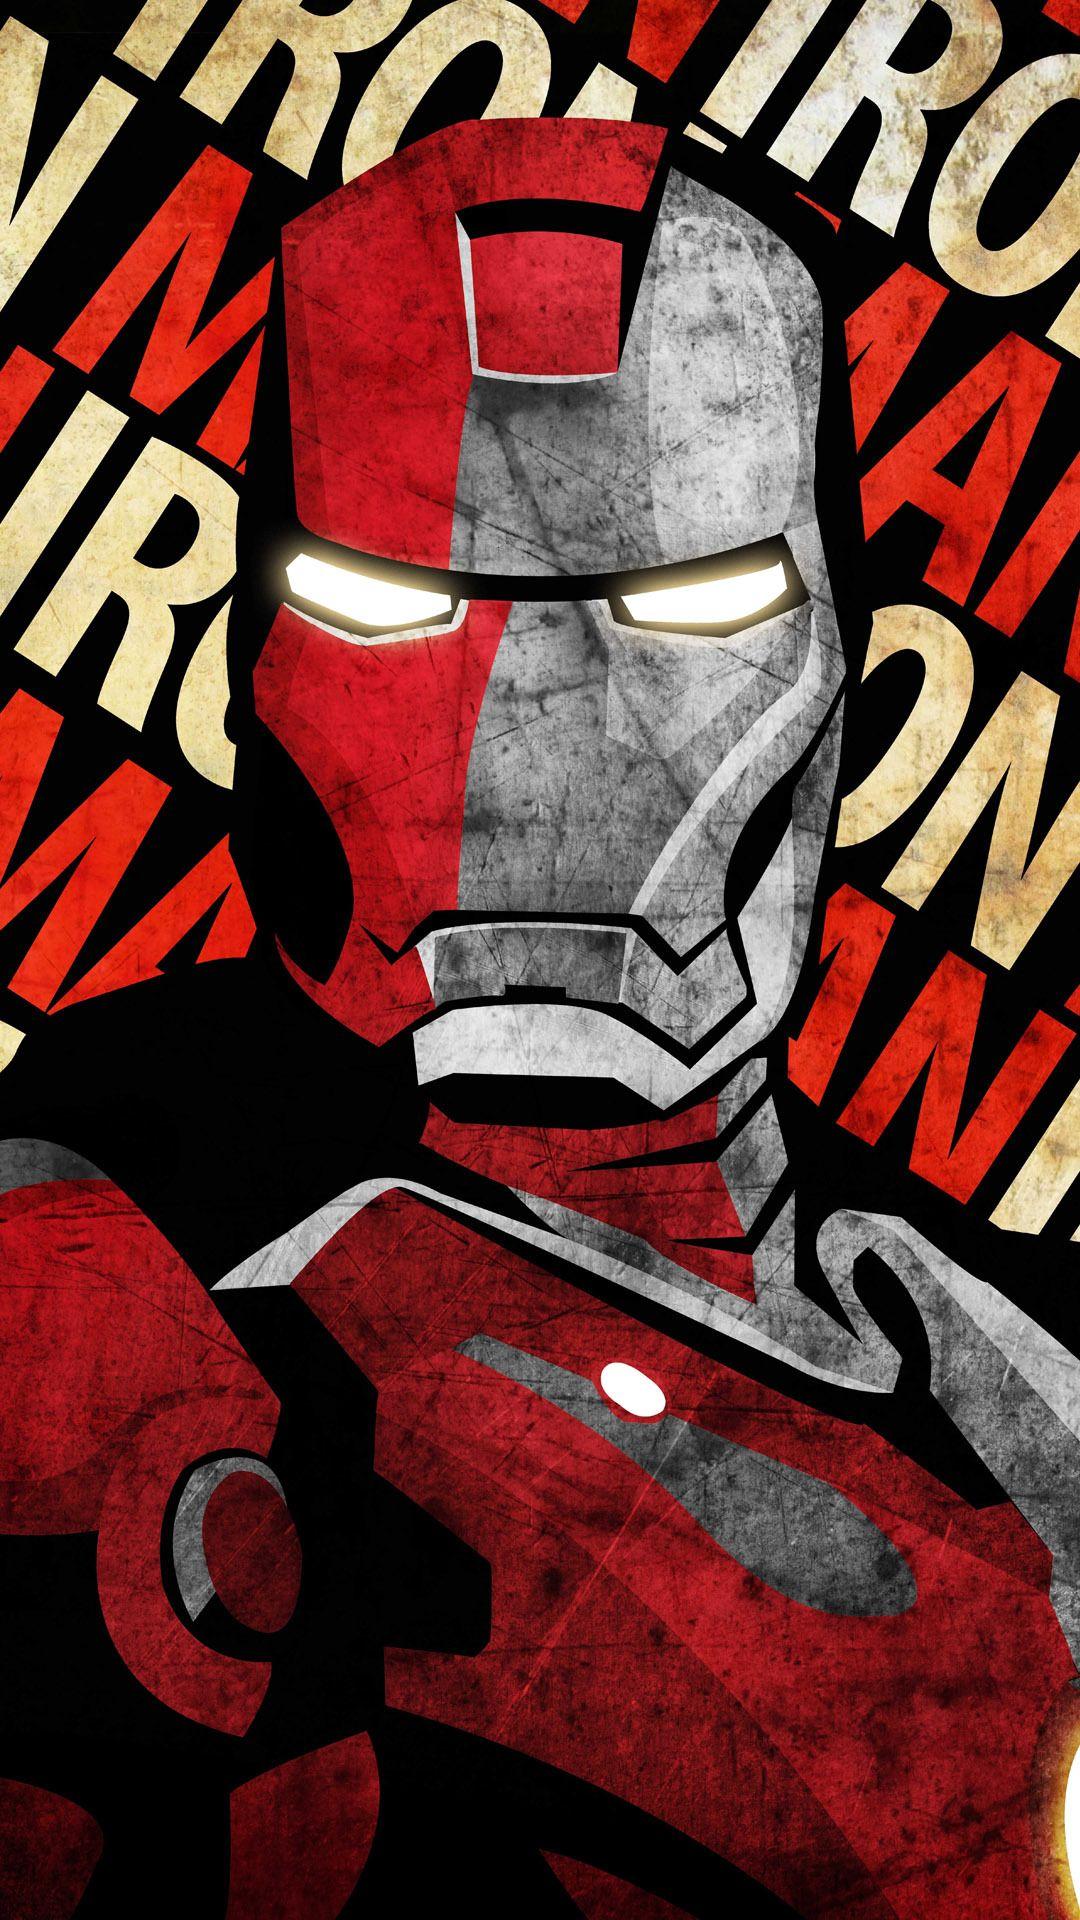 ironman comic wallpaper hd - Buscar con Google